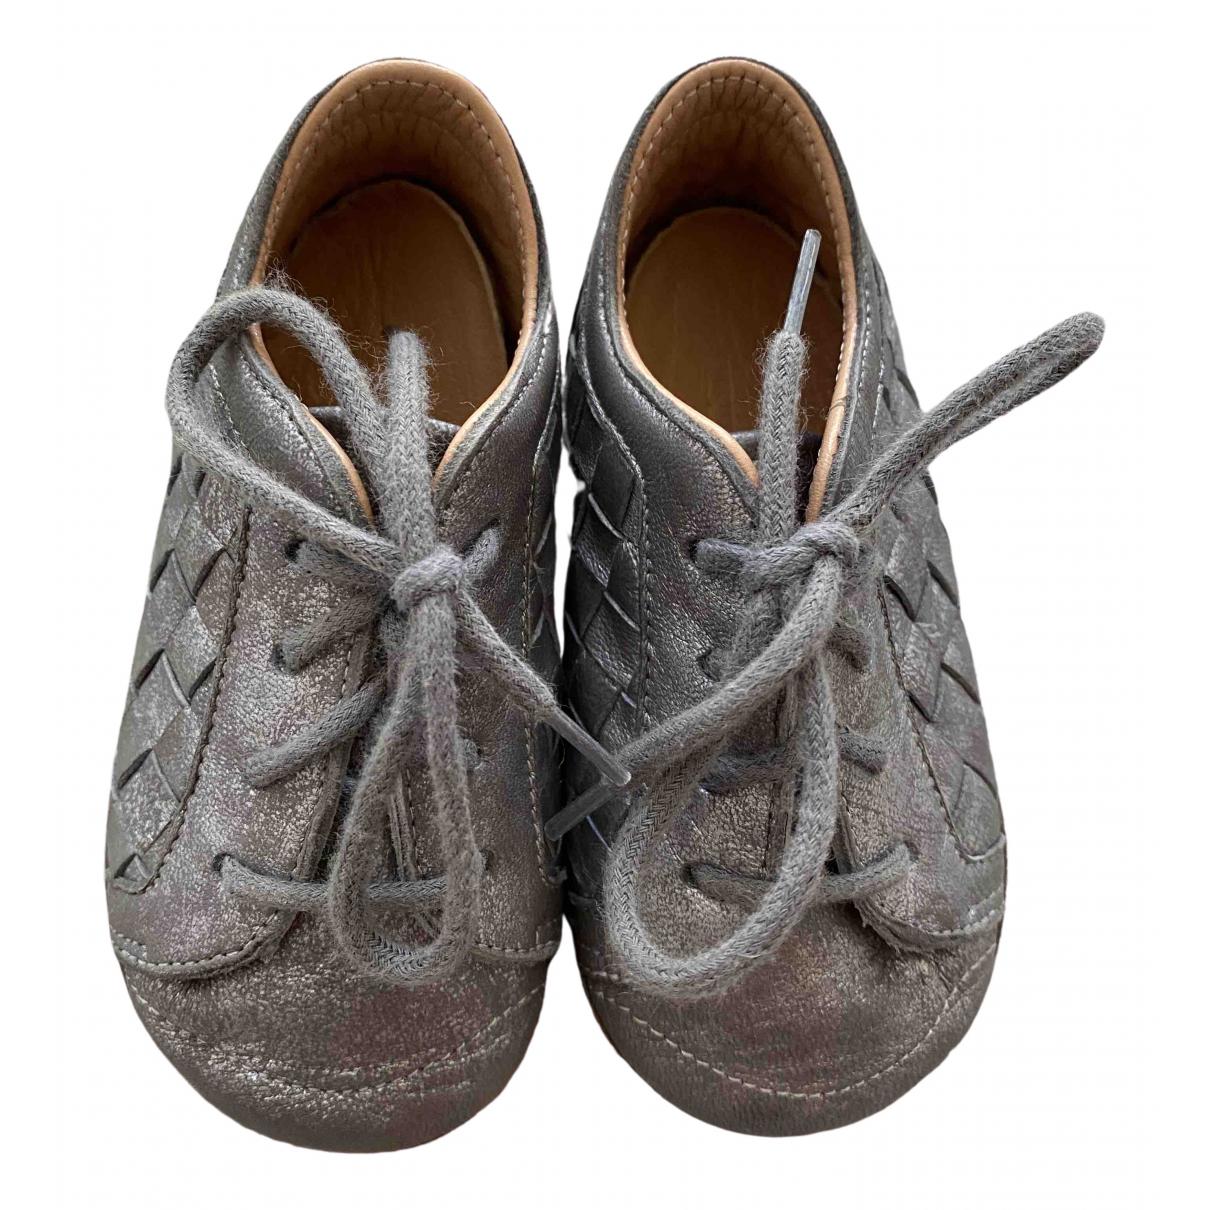 Bottega Veneta \N Silver Leather First shoes for Kids 19 FR